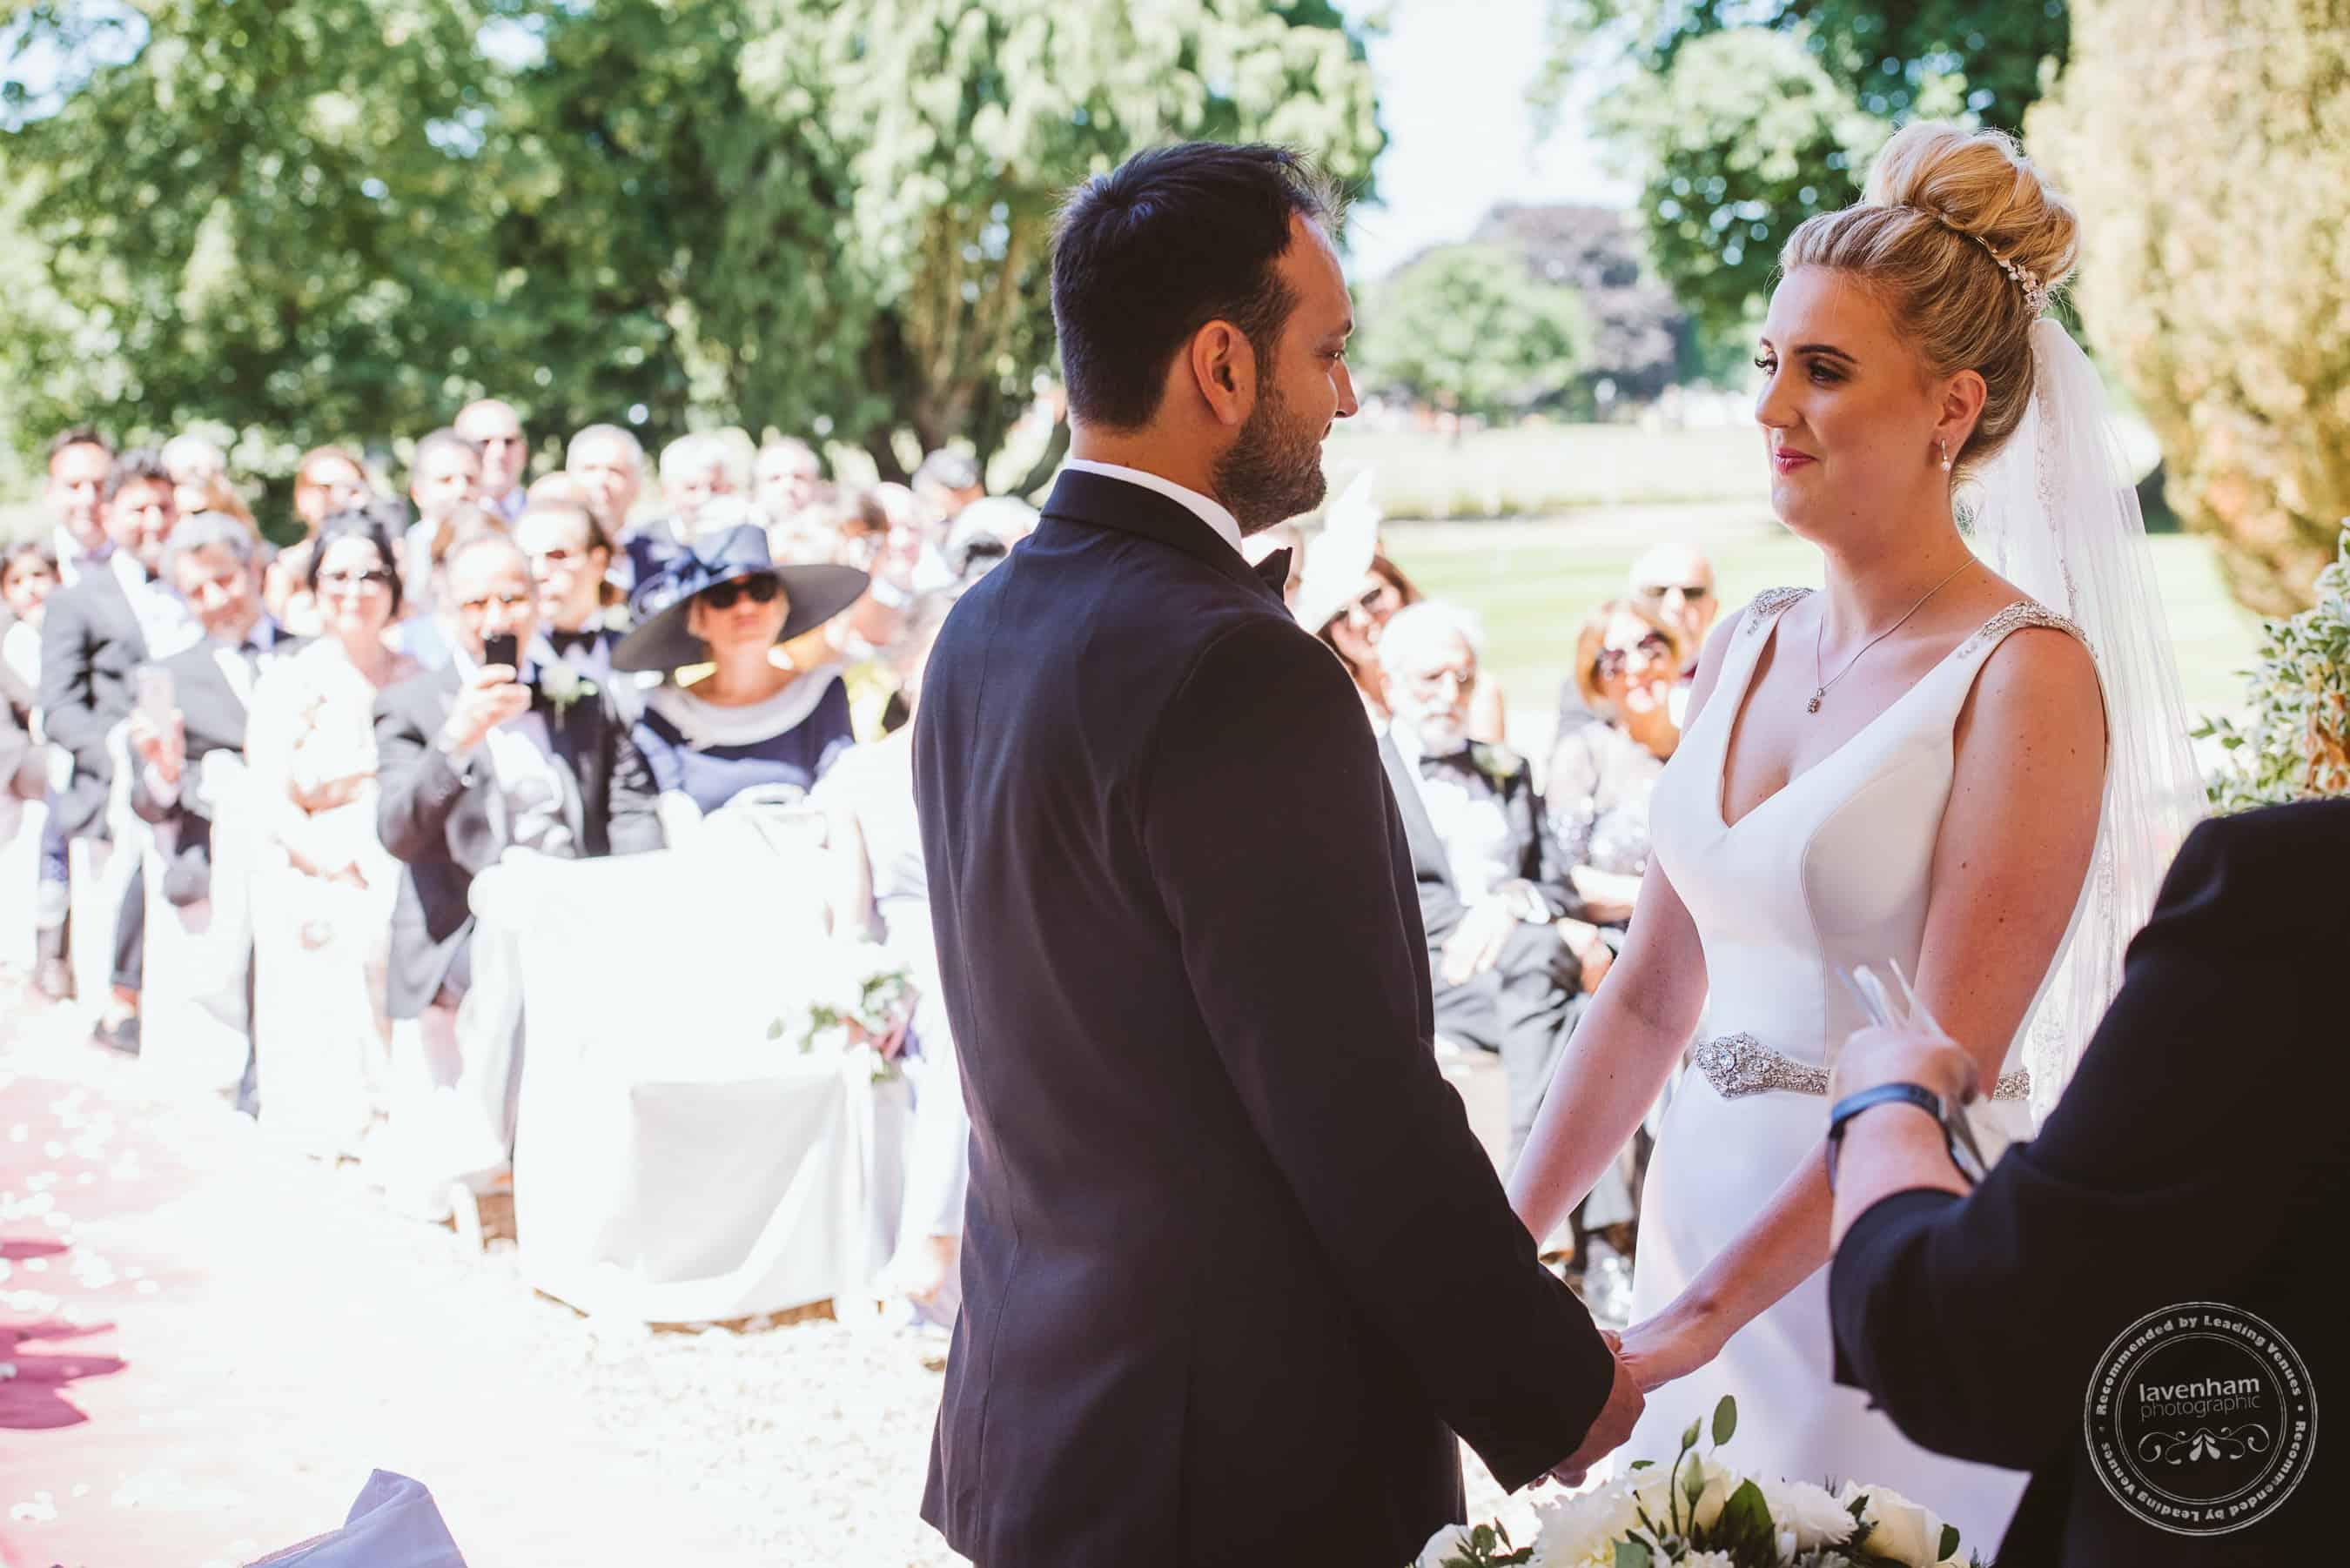 220618 Gosfield Hall Wedding Photography Lavenham Photographic 0077